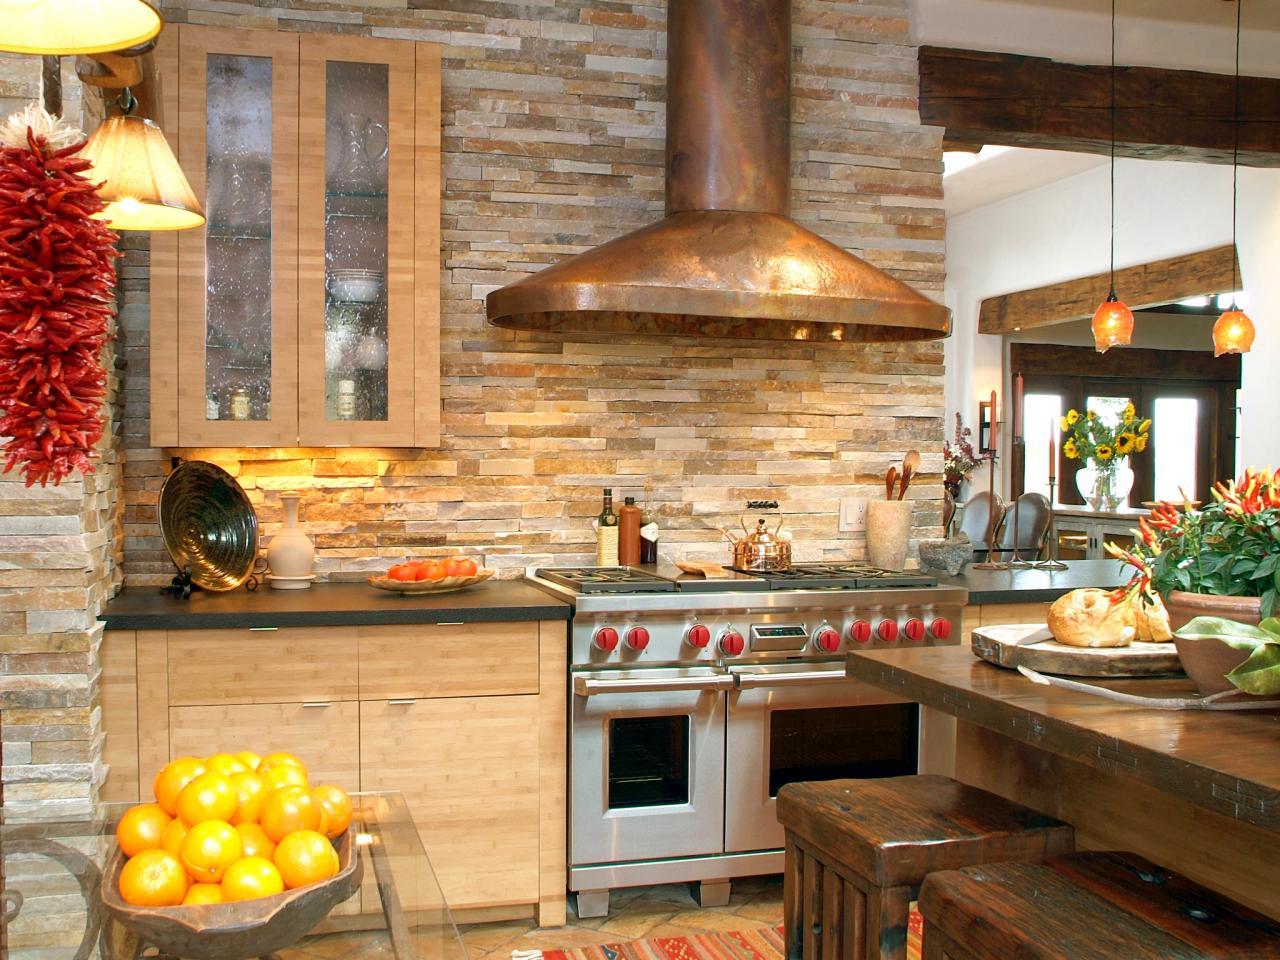 original_hamilton-gris-pierre-dosseret de cuisine_s4x3-jpg-rend-hgtvcom-1280-960